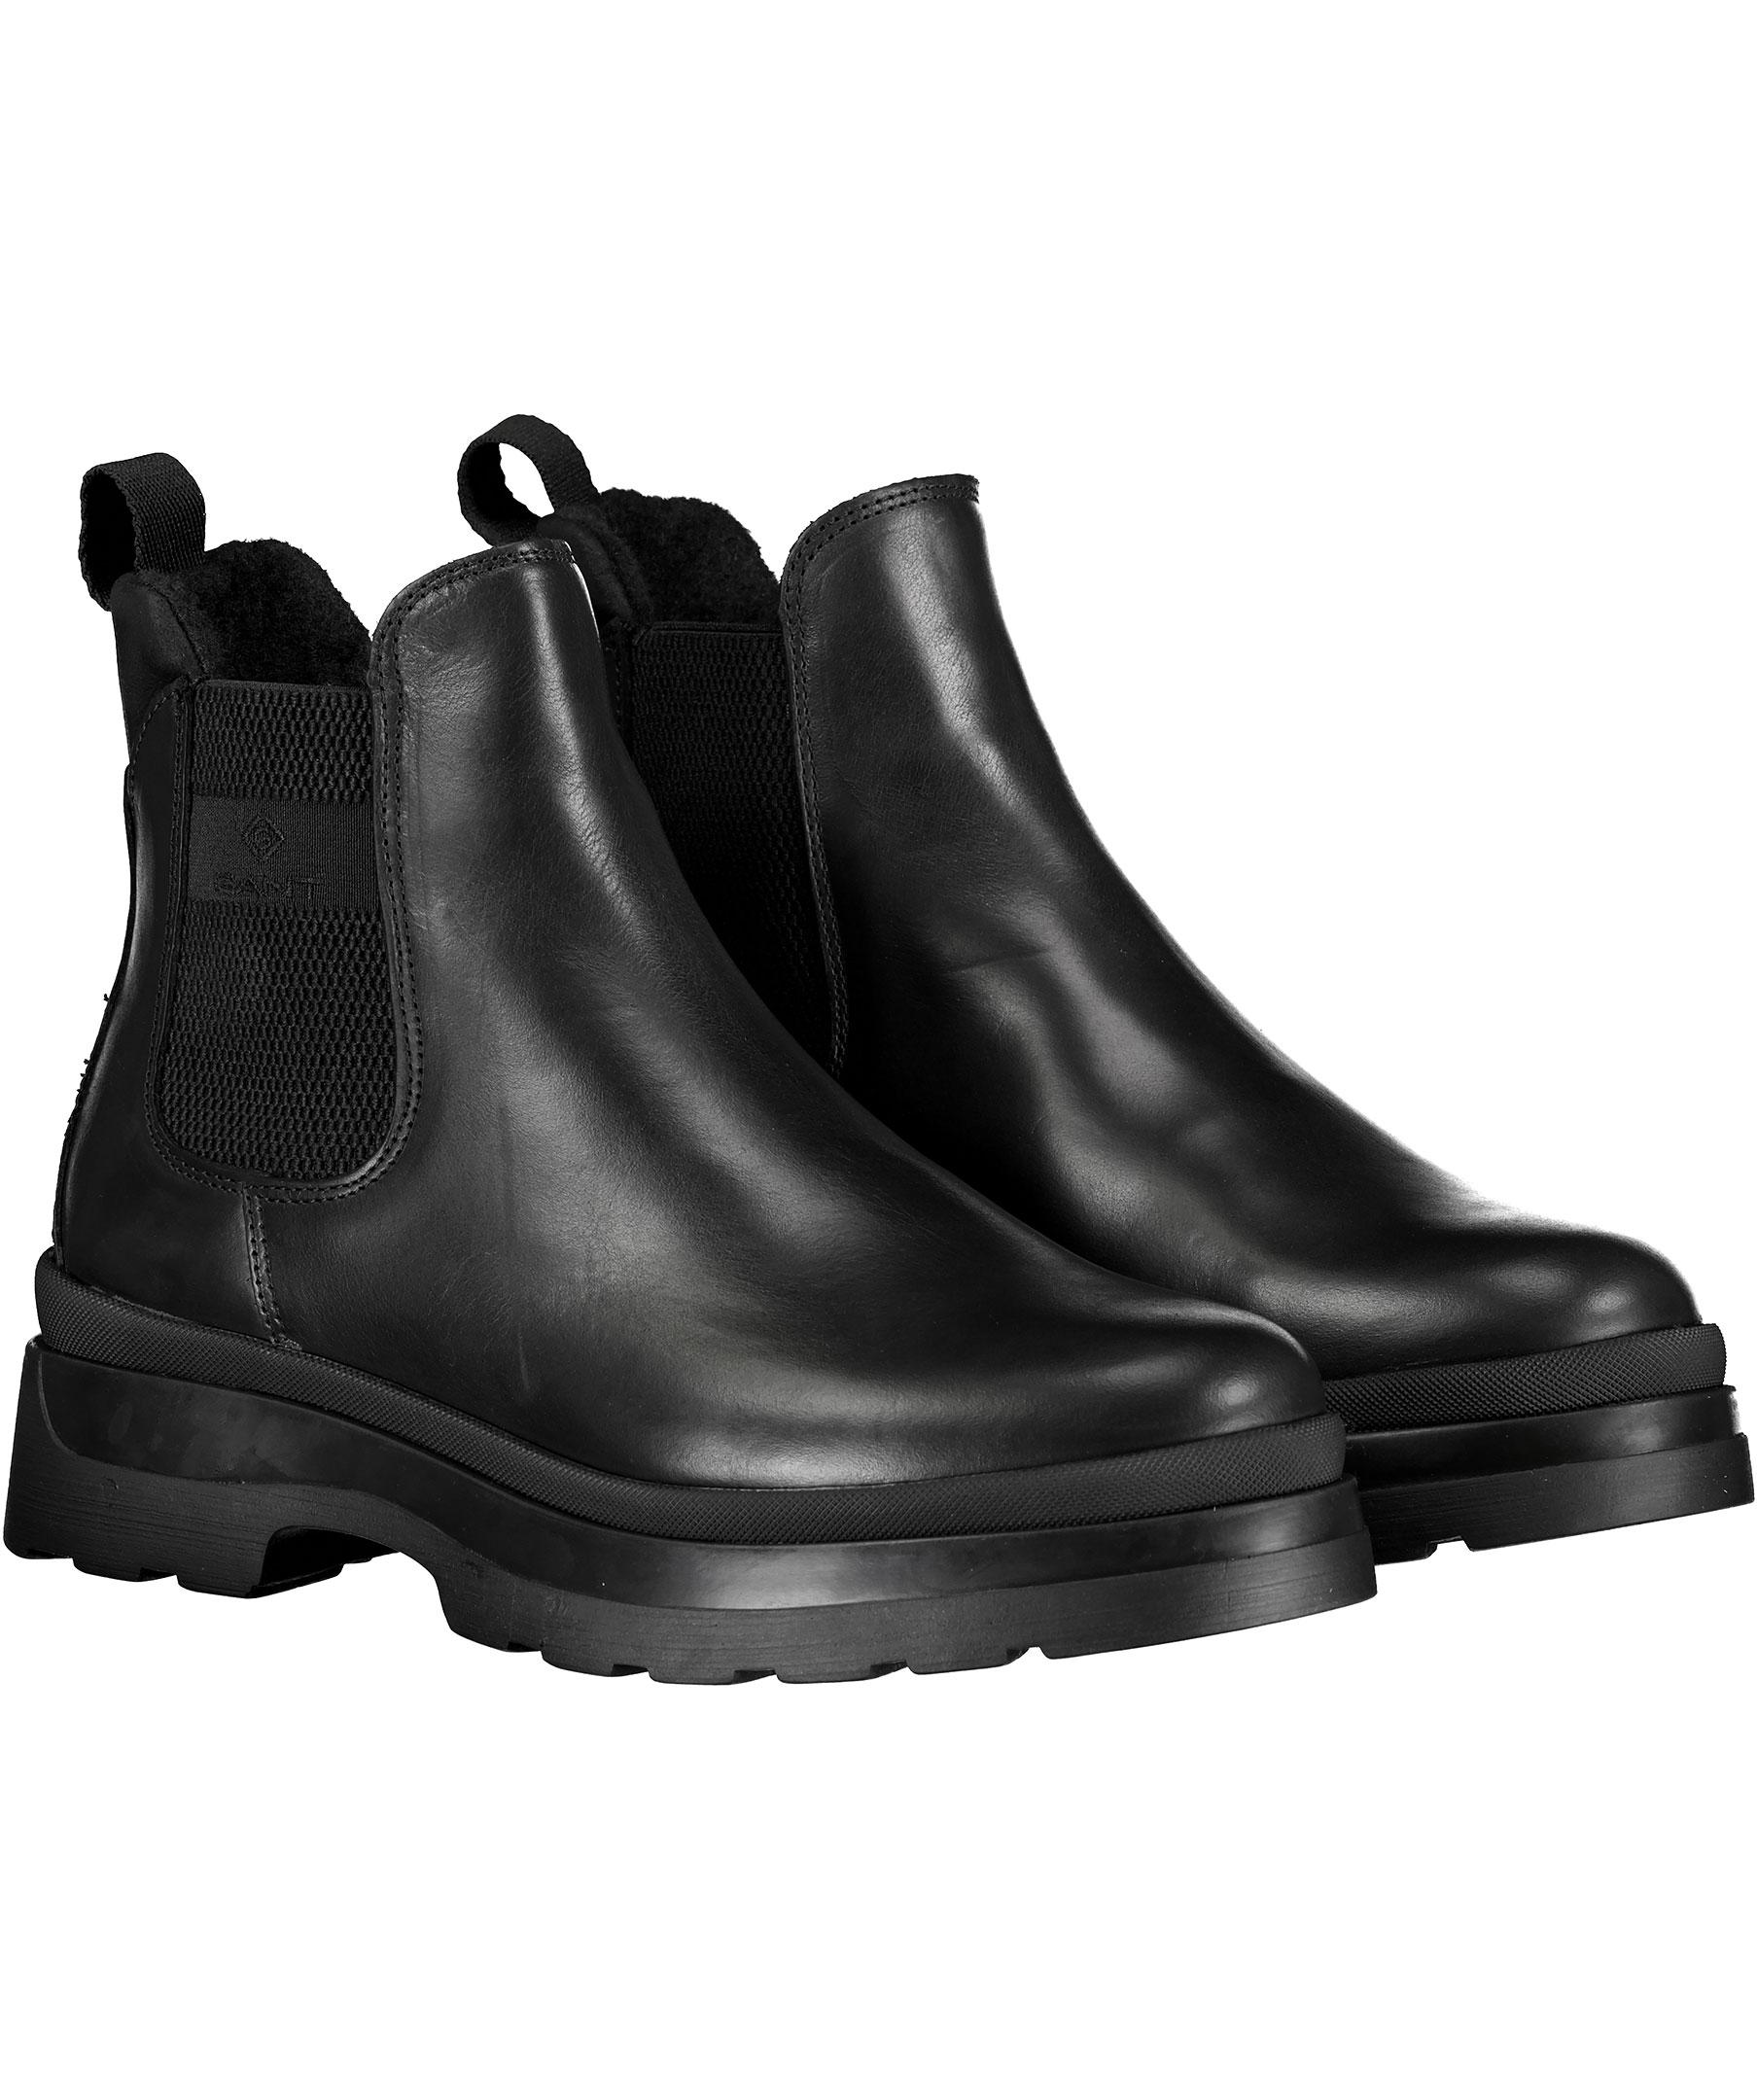 Macquaire G (Black) (4999 kr) R.M. Williams  